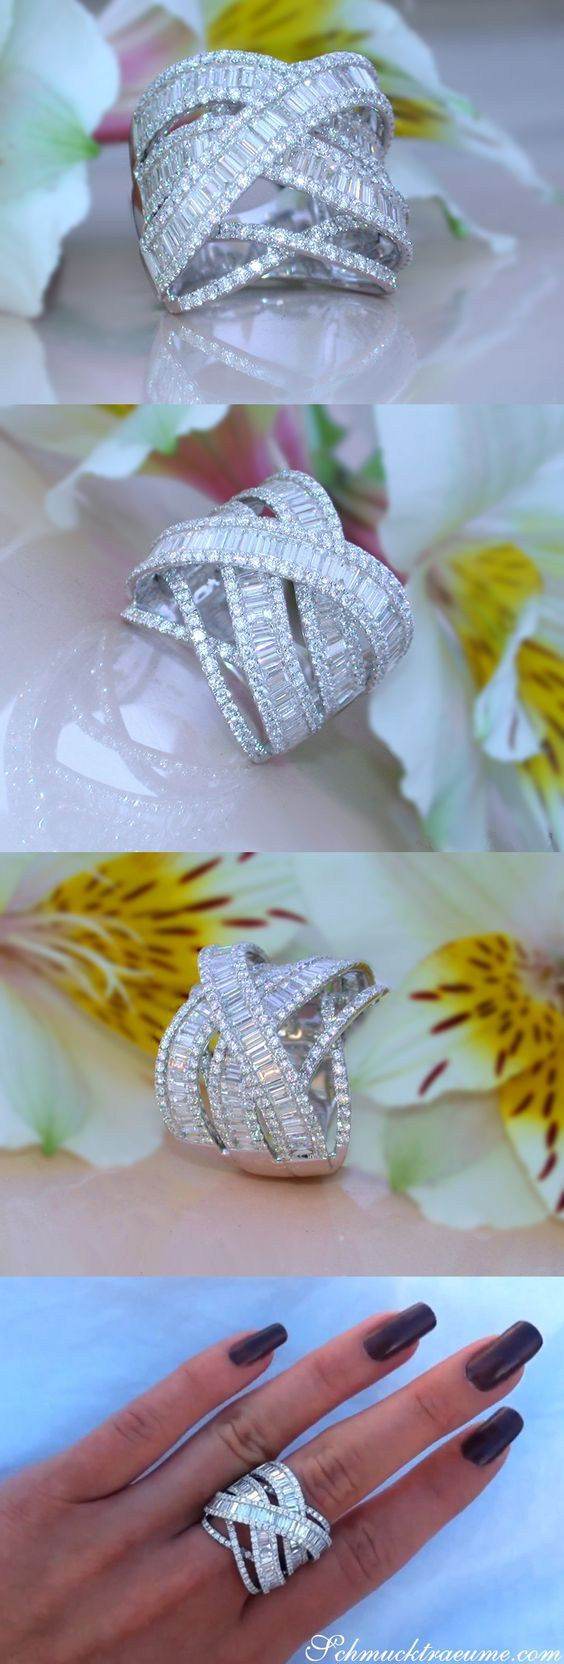 Stunning Crossover Diamond Ring | 4.73 ct. G VS1 | Whitegold 18k – schmucktraeume.com Like: www.facebook.com/…